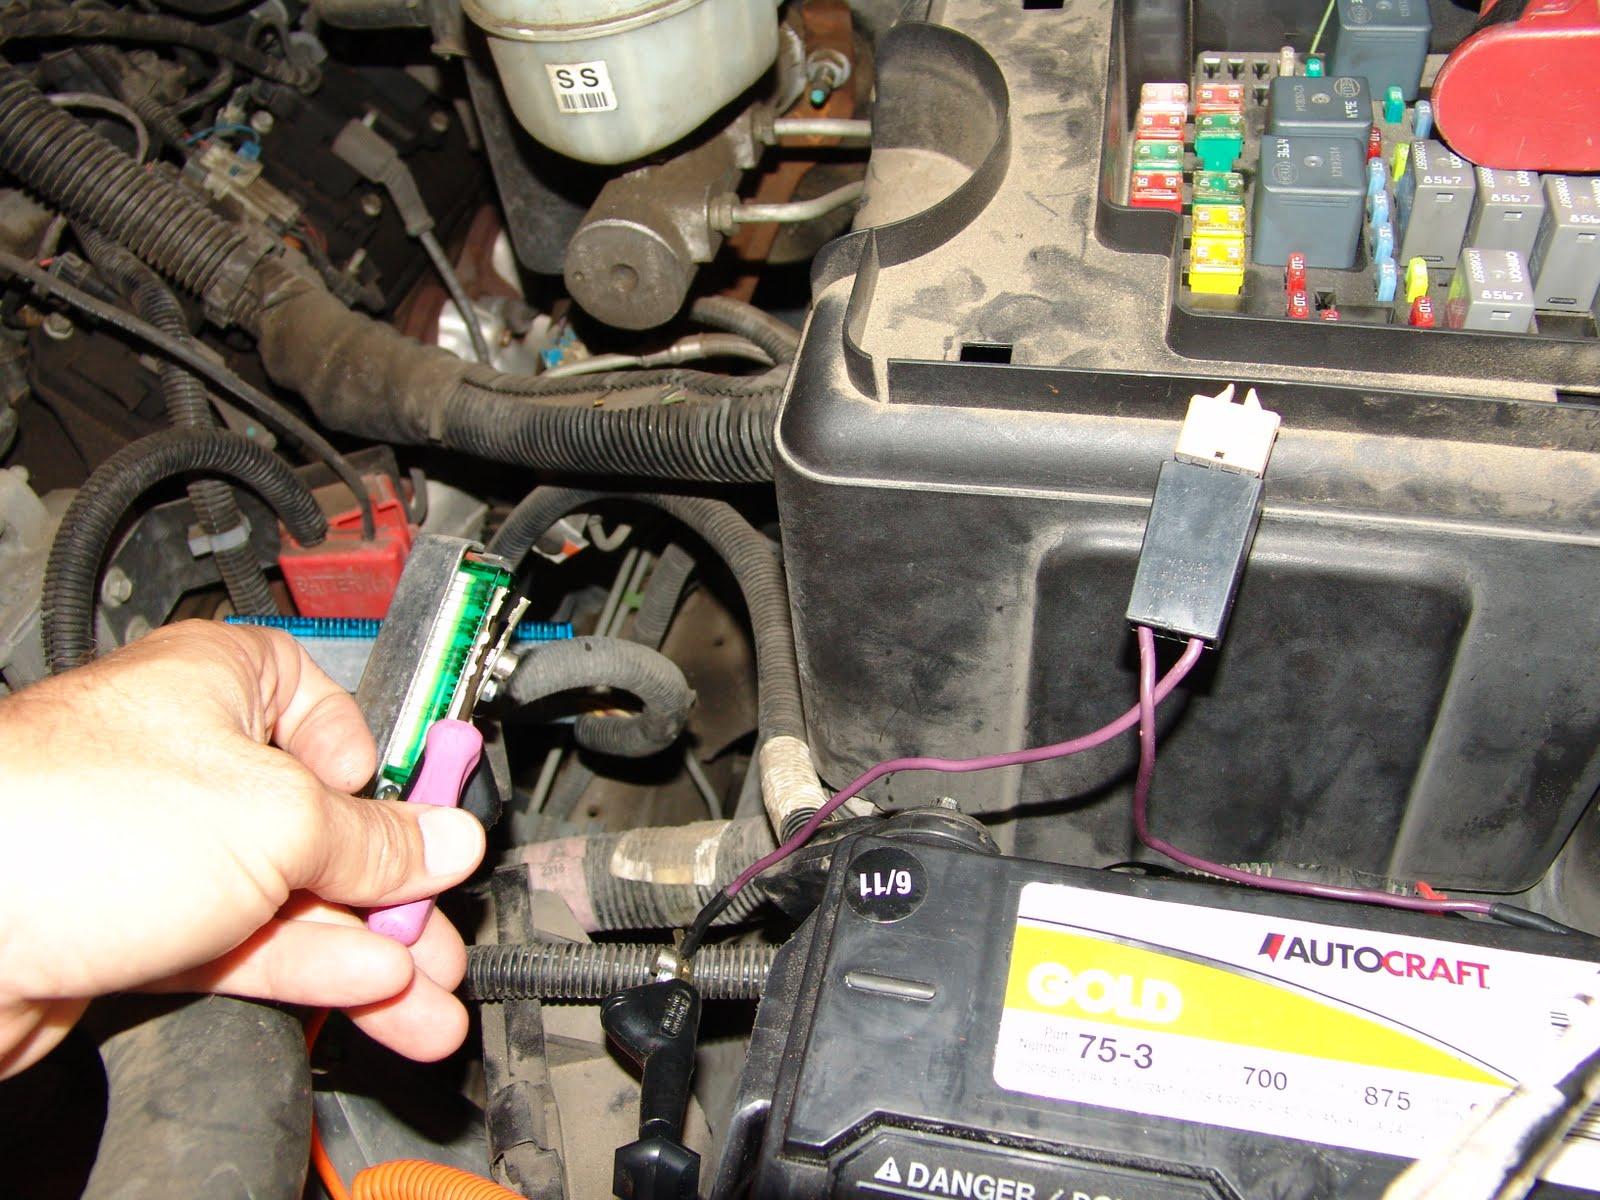 dsc05579 hummer h3 fuse box diagram hyundai tucson fuse box diagram wiring hummer [ 1600 x 1200 Pixel ]